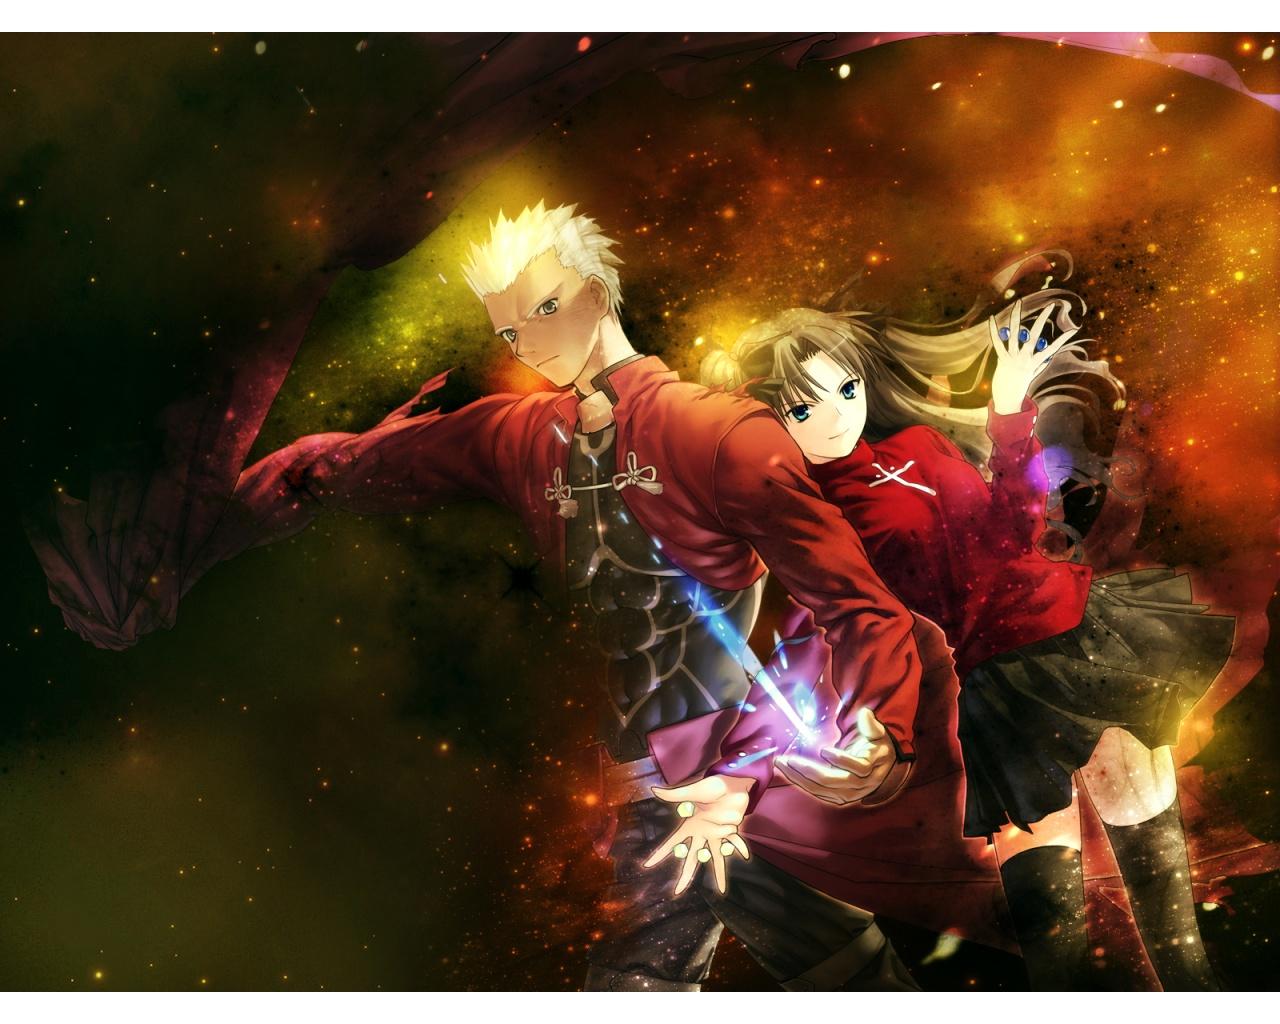 Fate Stay Night Wallpaper Archer 36 Hd Wallpaper   Animewpcom 1280x1024